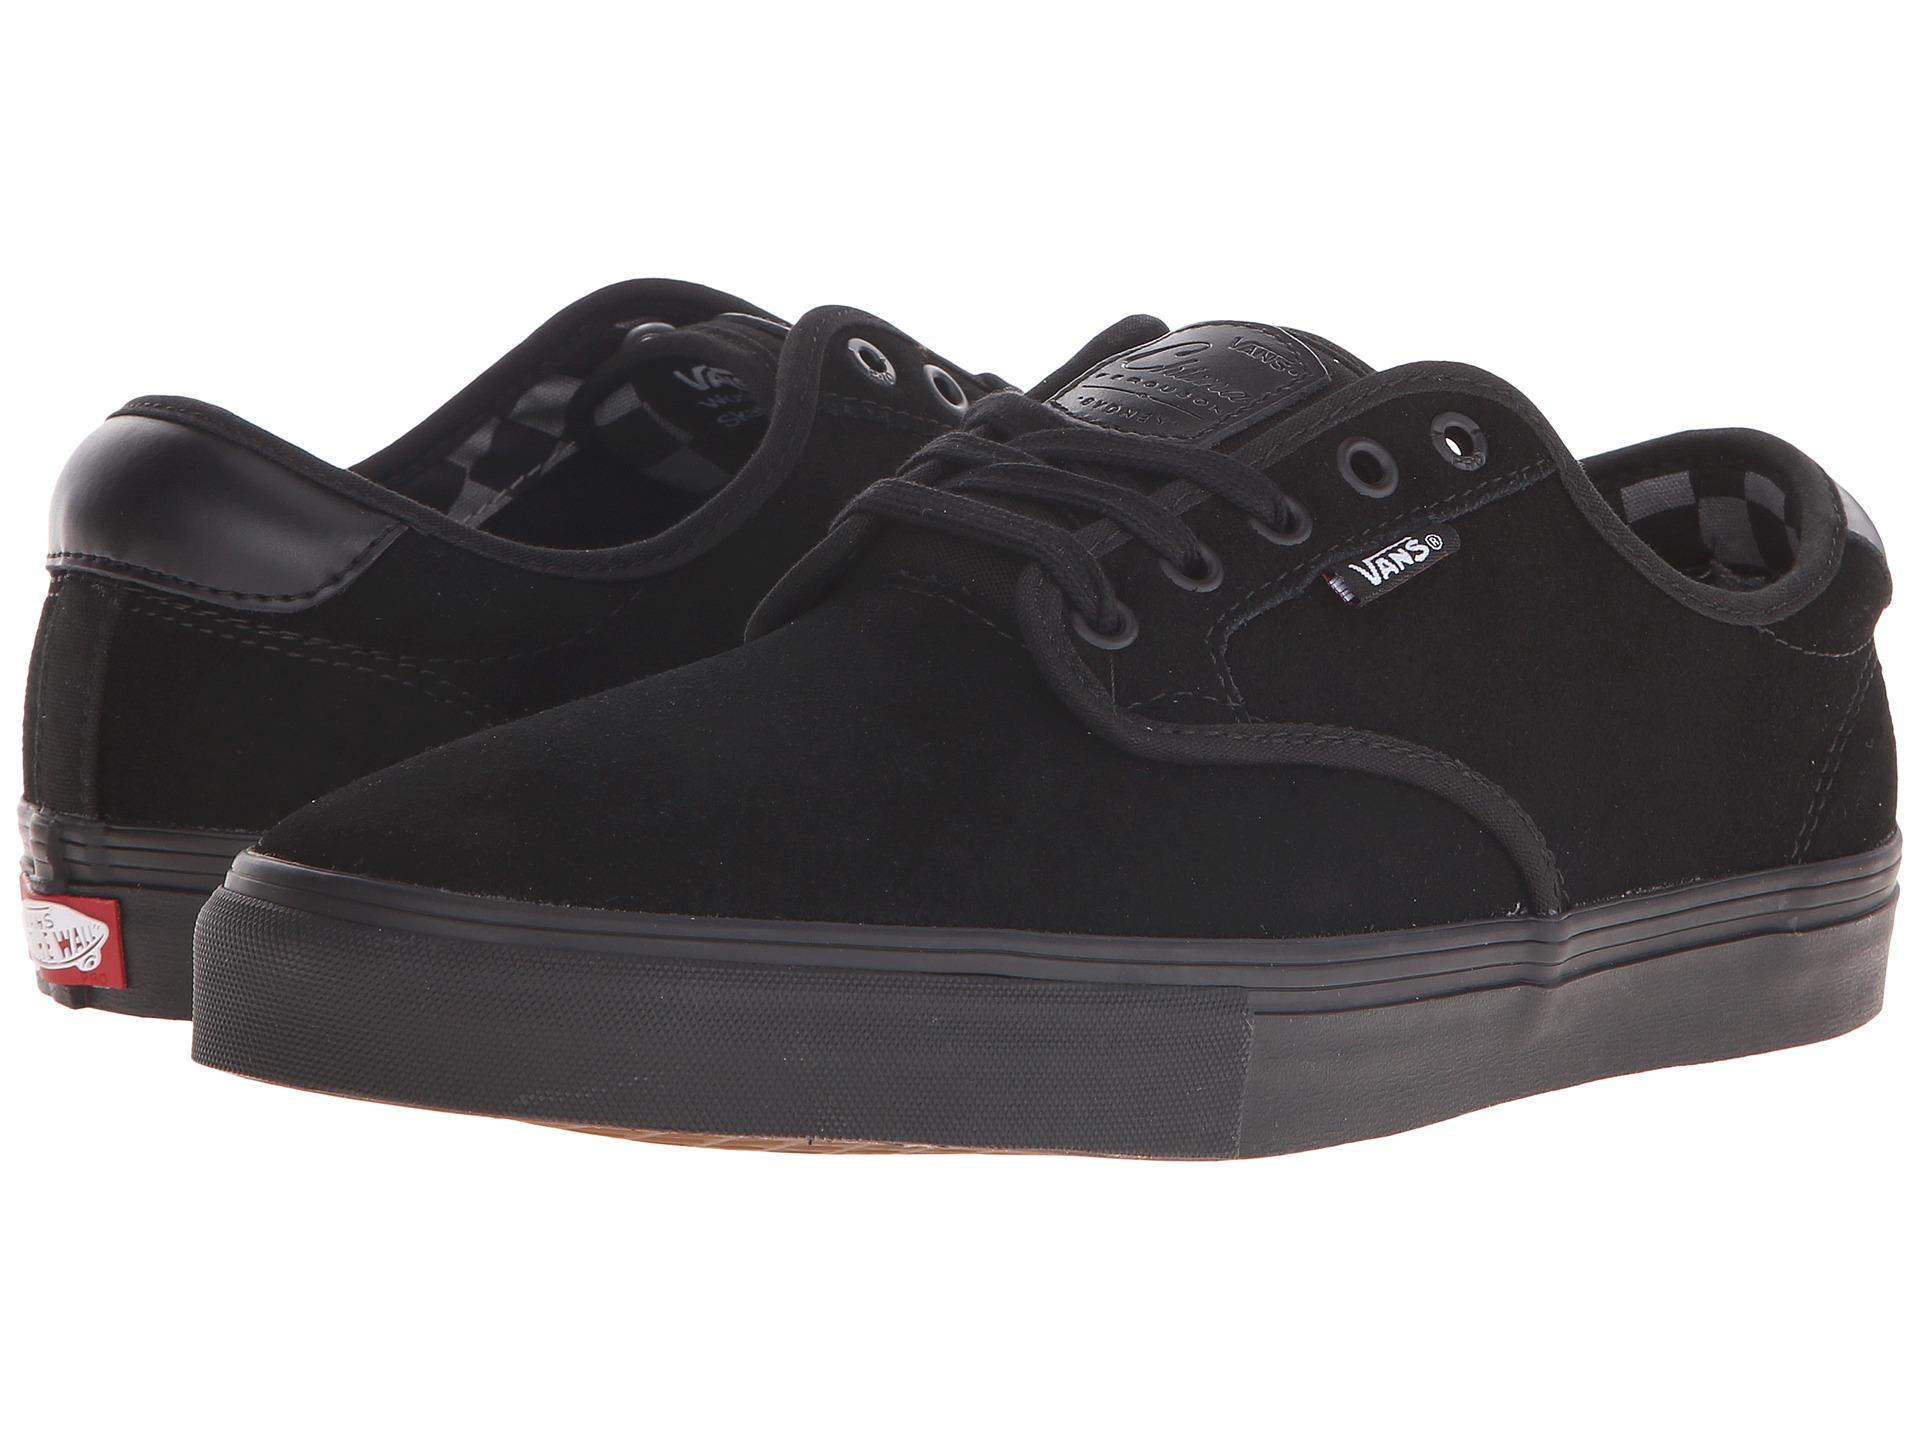 vans all black leather